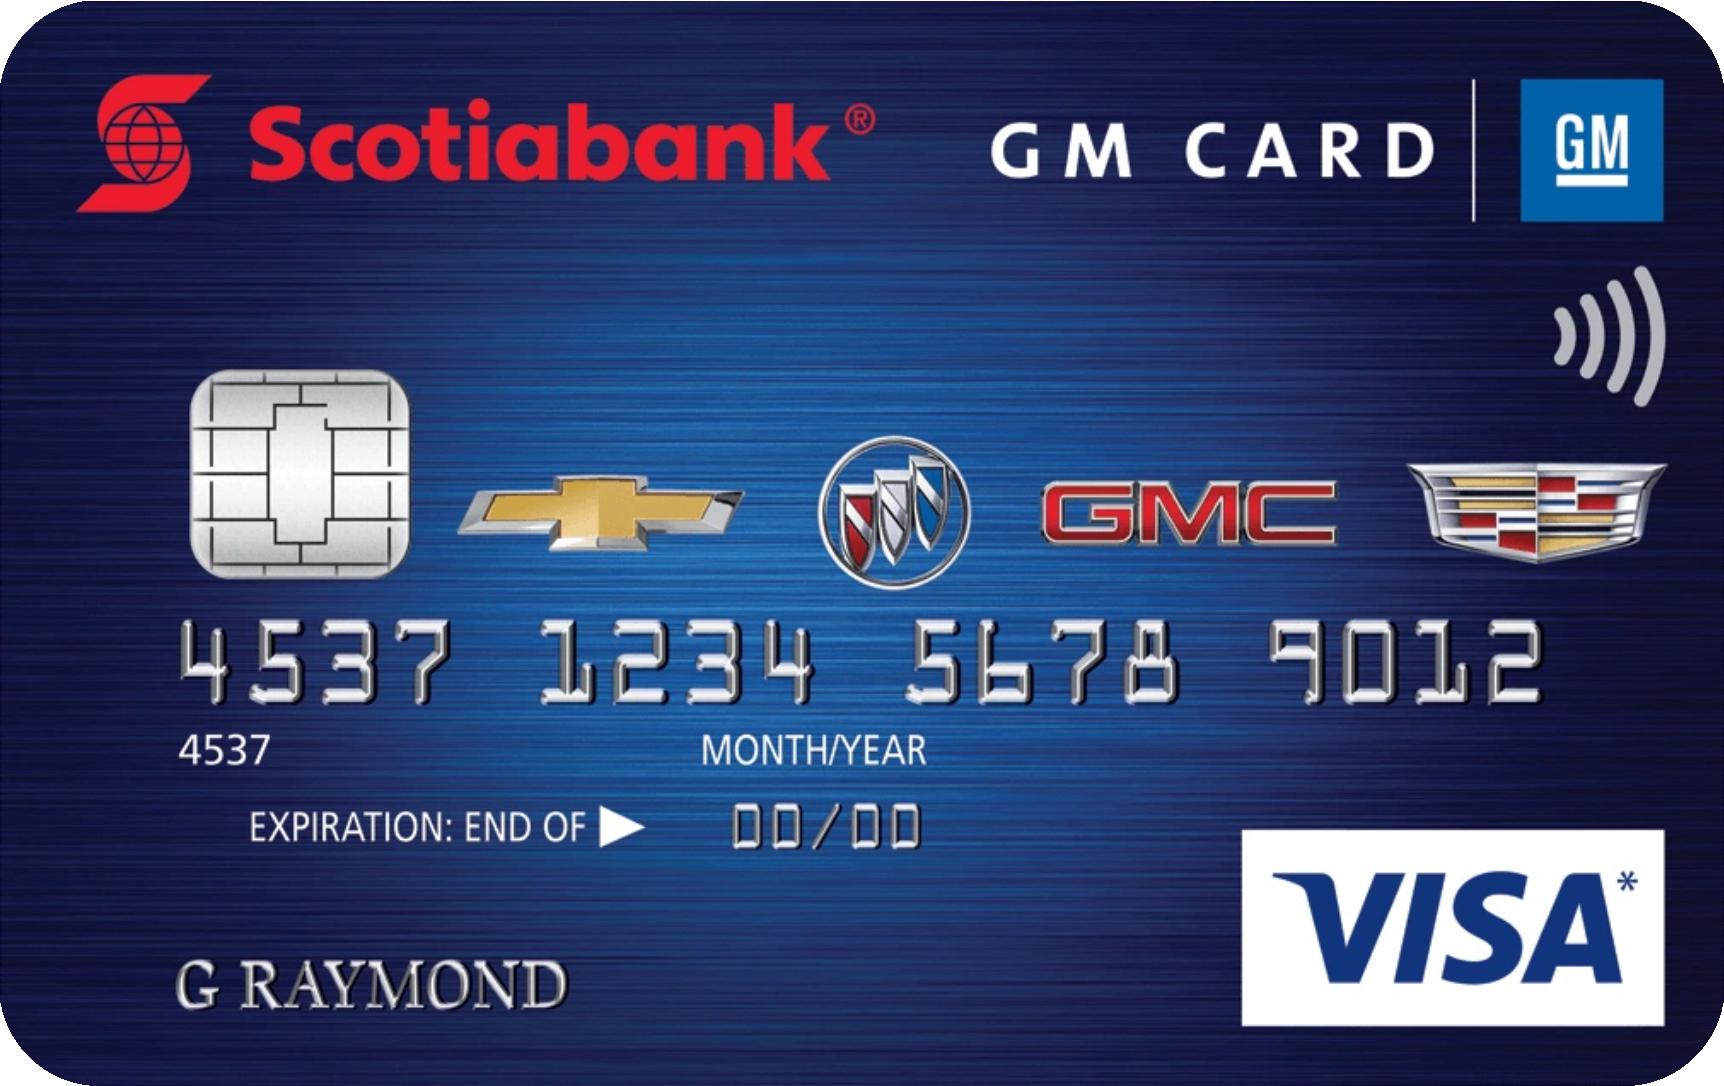 Scotiabank® GM® Visa card logo